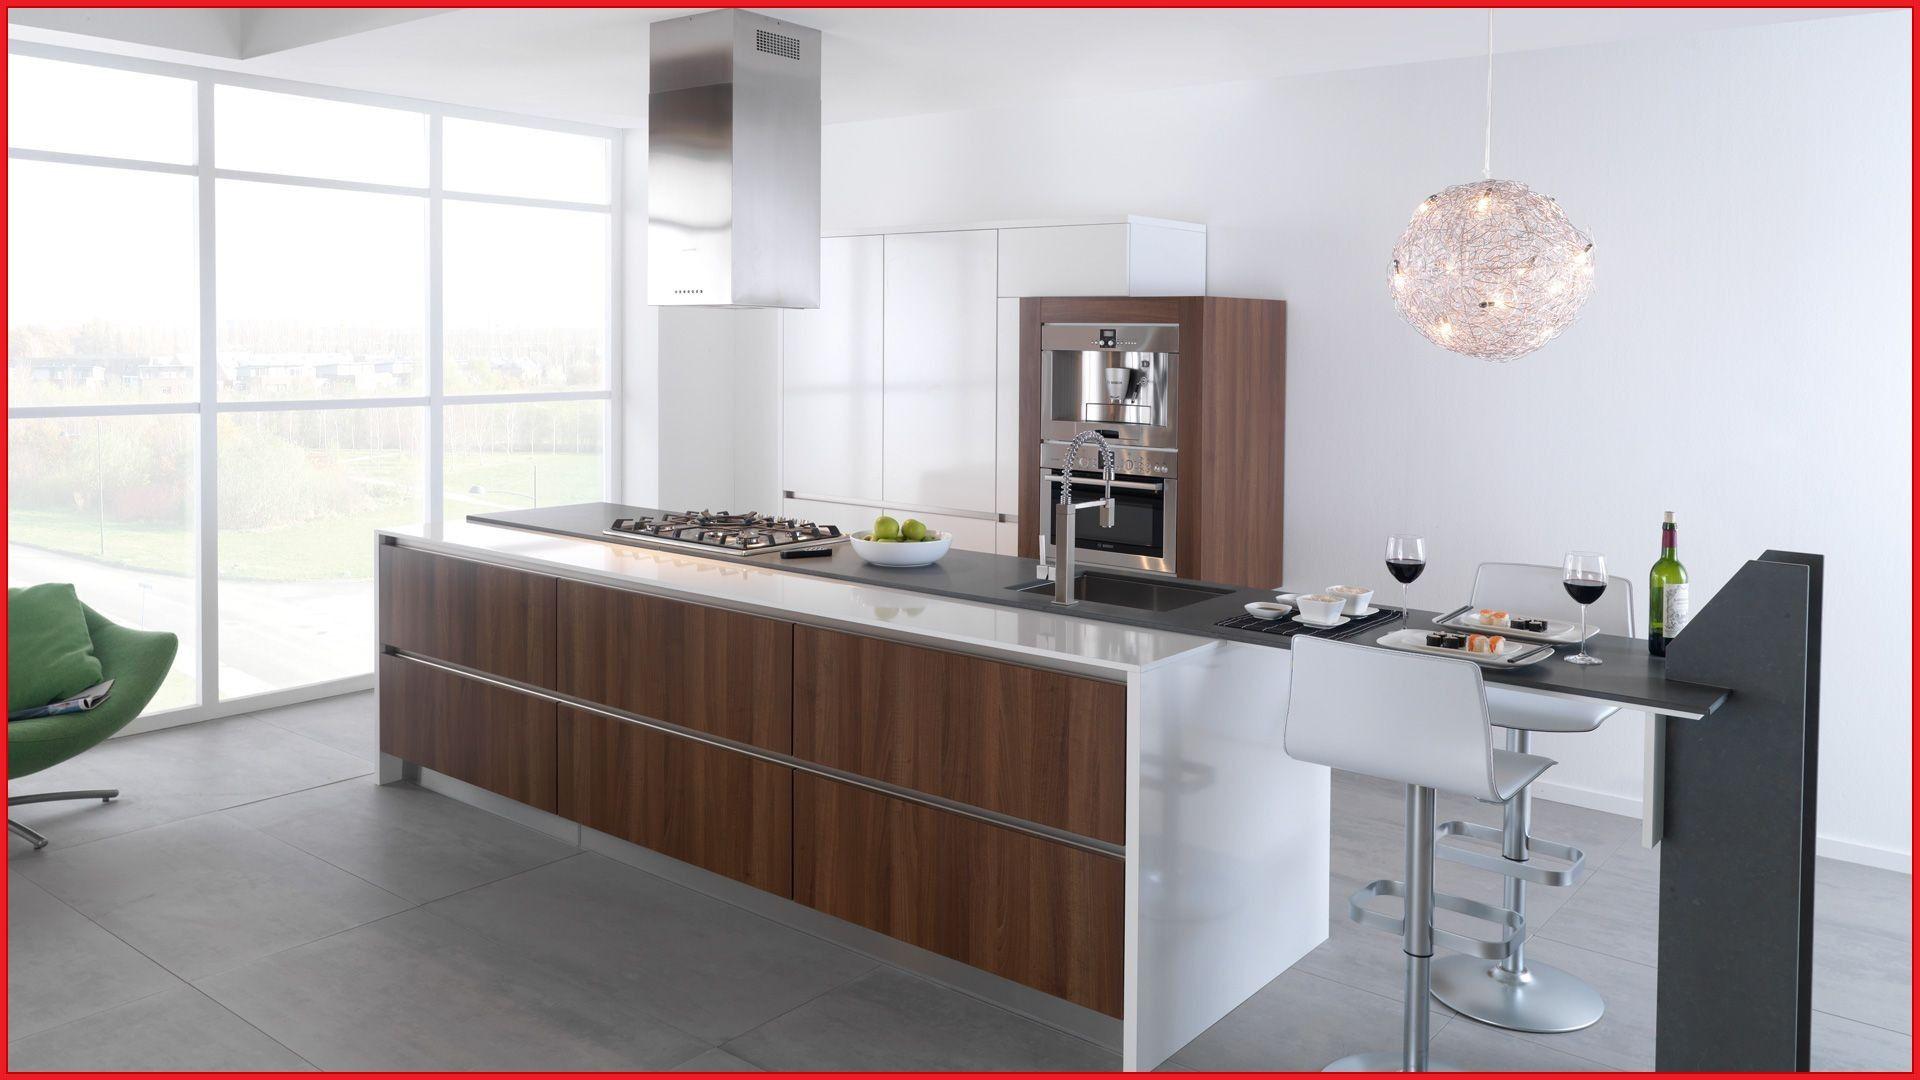 Tulp Keukens Alexandrium : Tulp keukens breda hi sv bestemd tulp keukens veenendaal